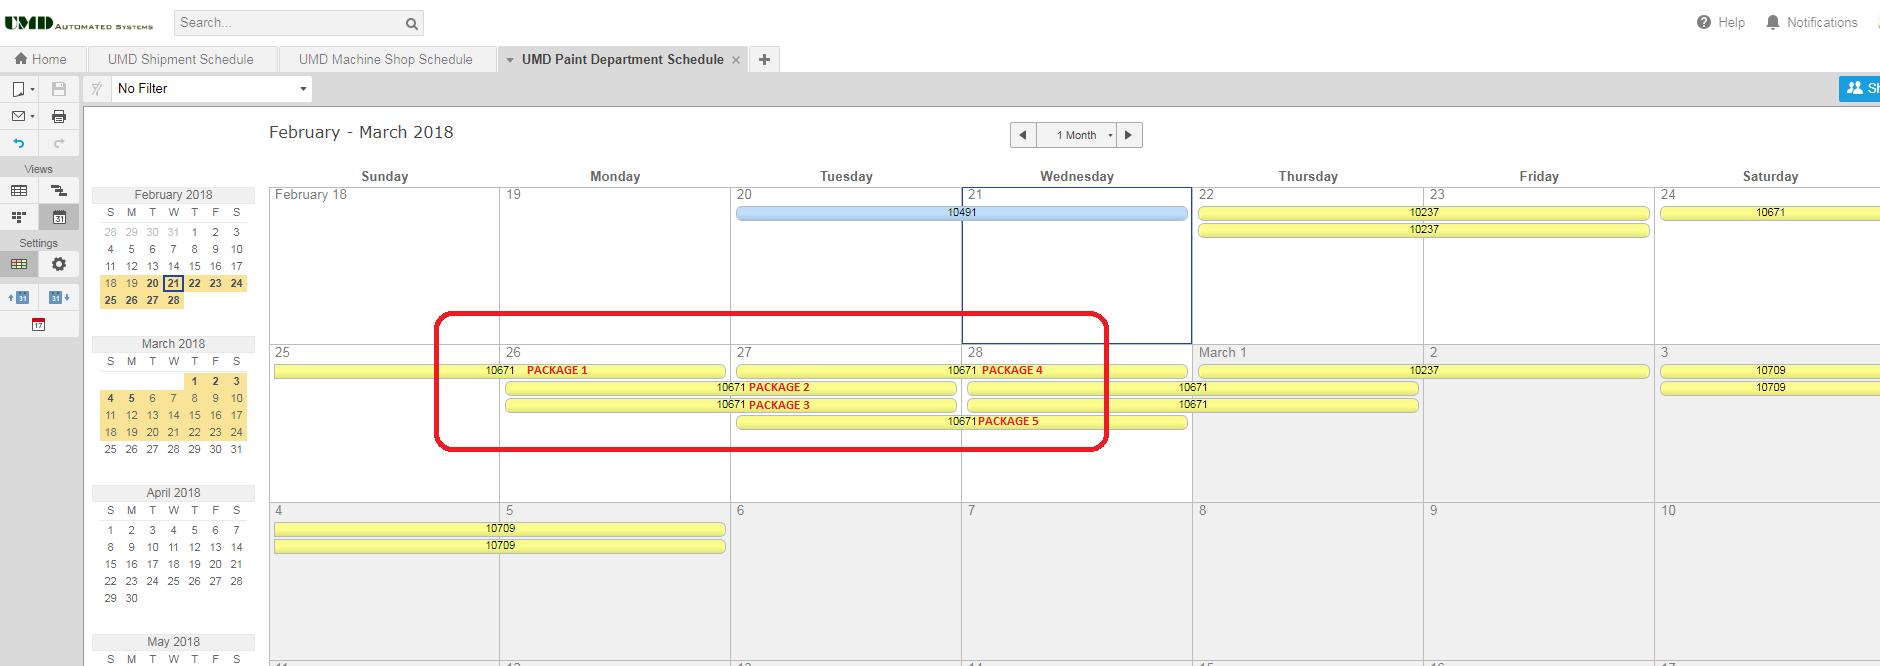 Calendar View Wishlist.png